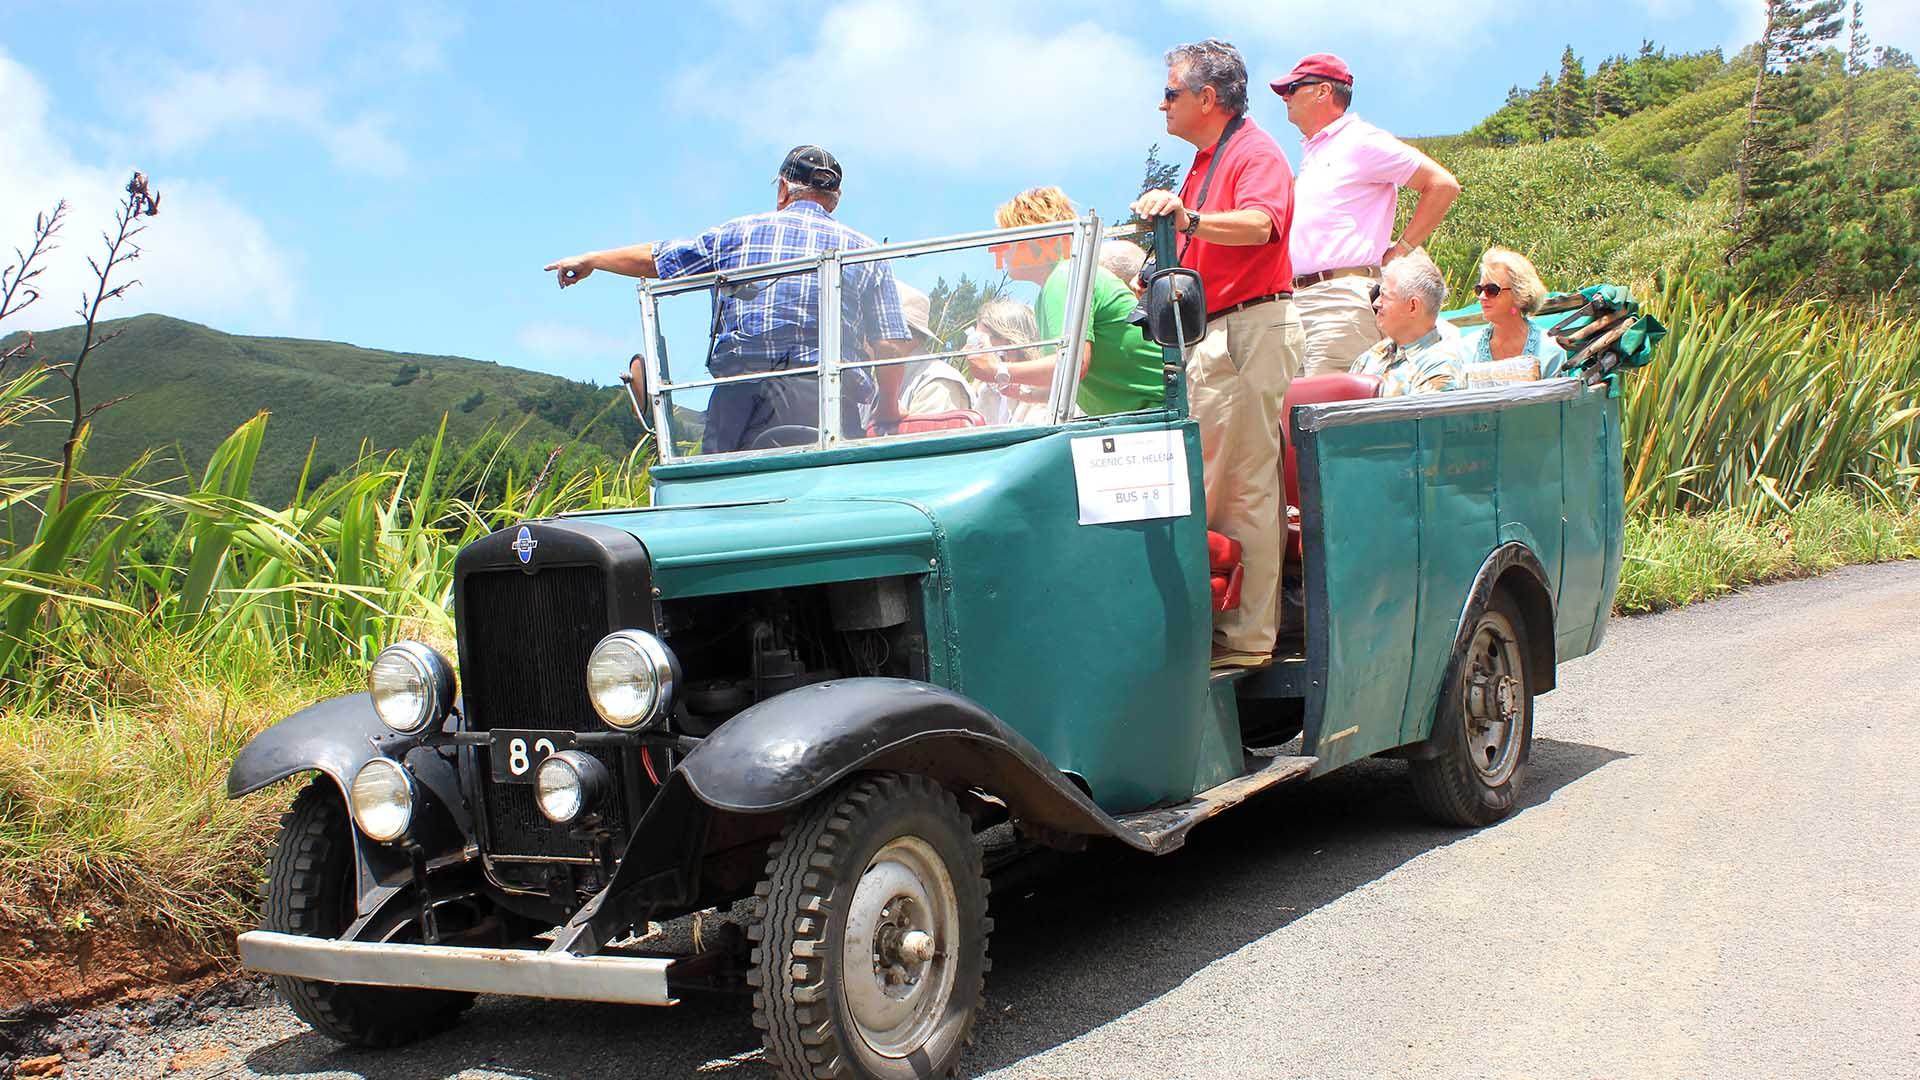 Corkers Tourist Services